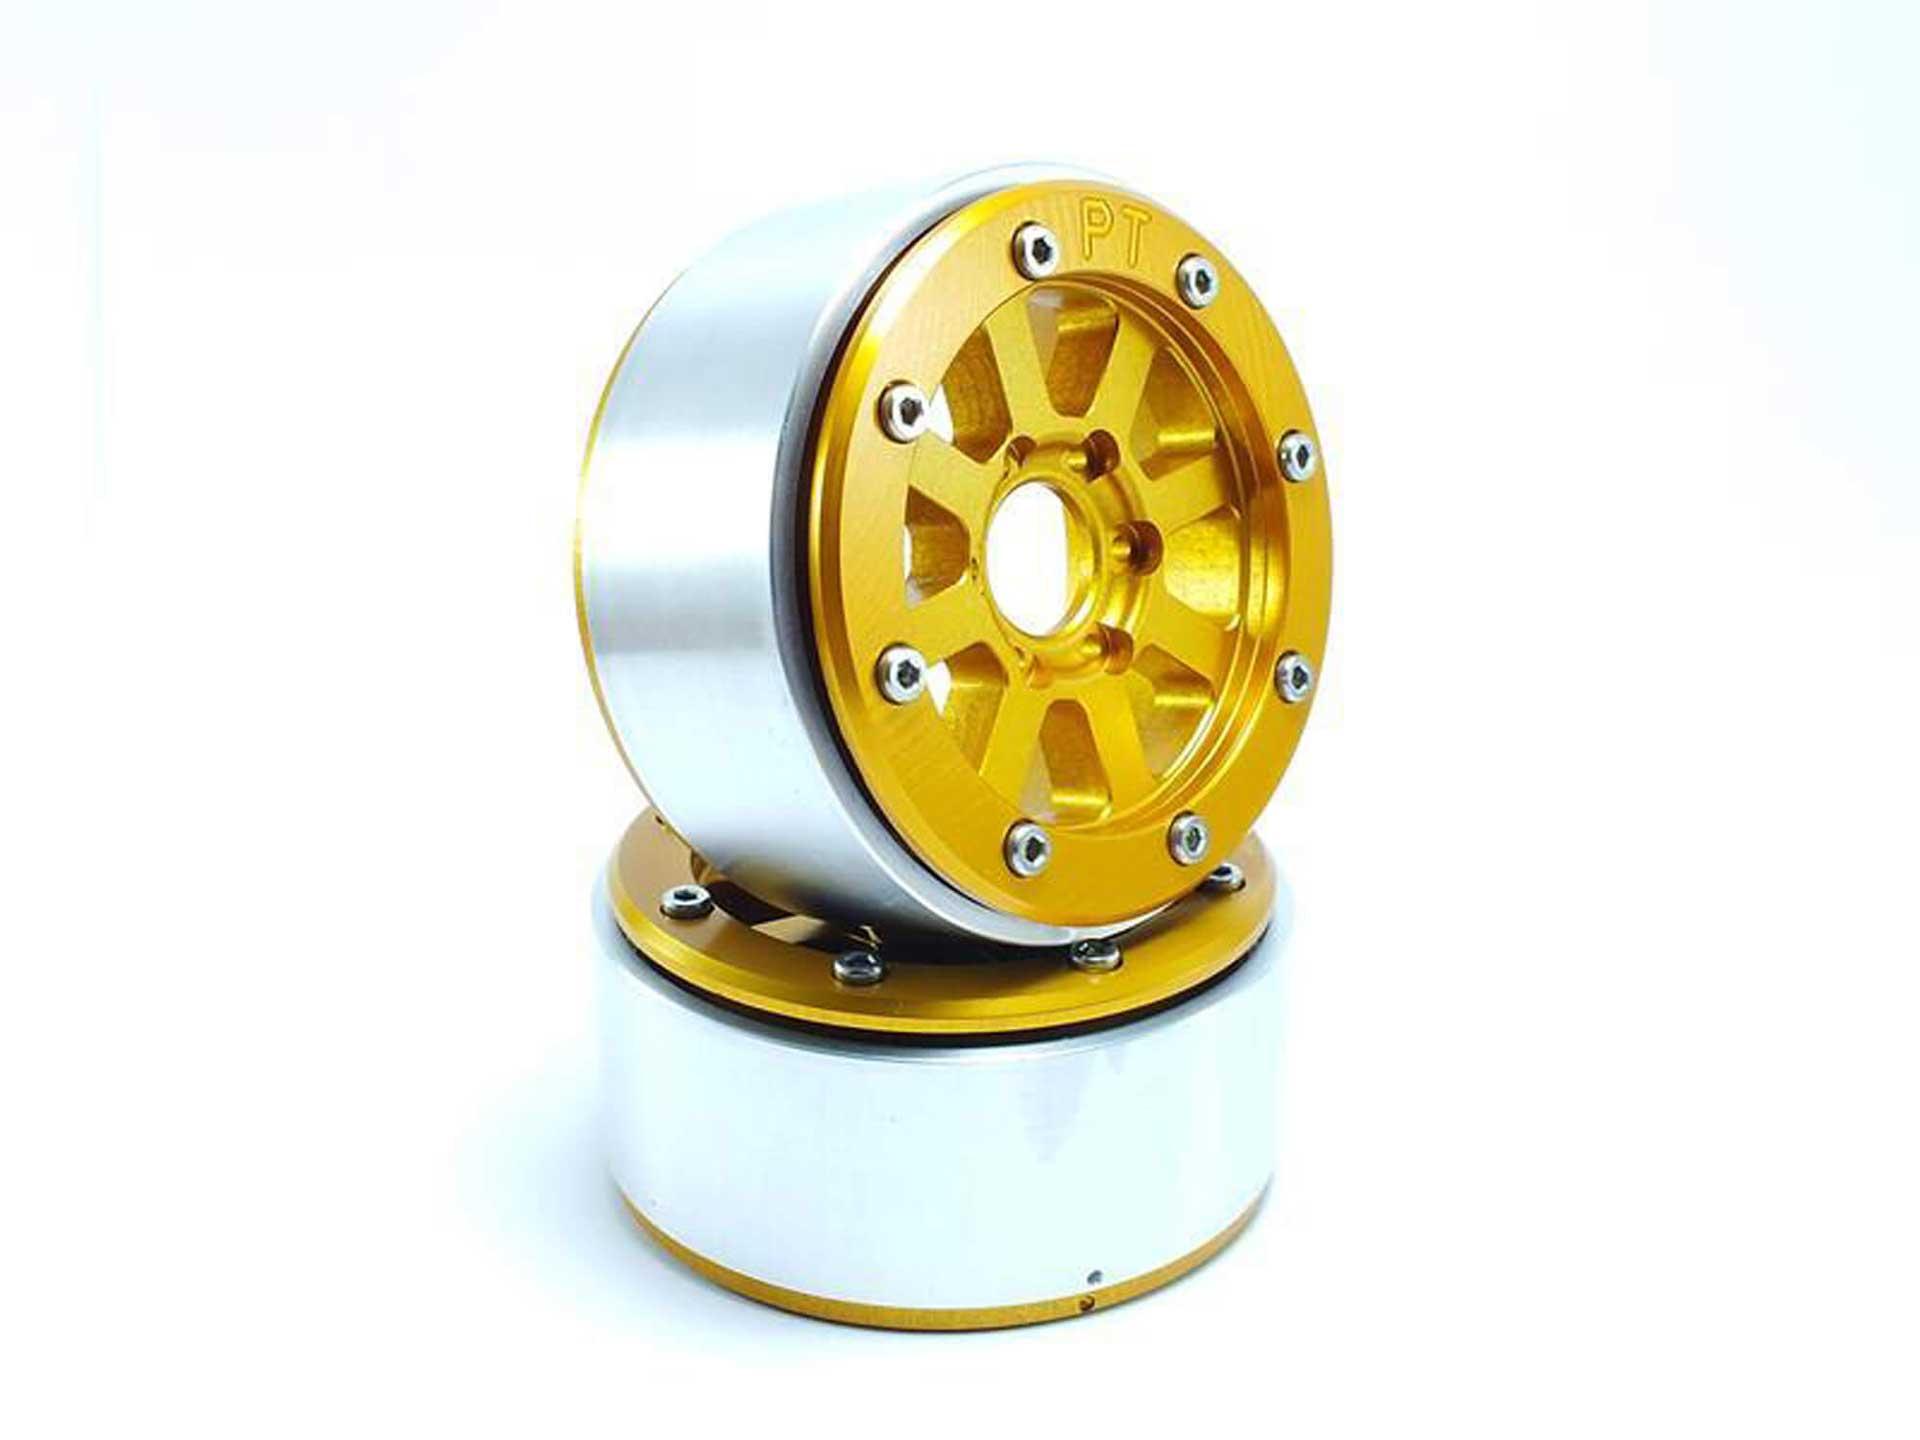 Metsafil Beadlock Wheels HAMMER gold/gold 1.9 (2 St.) ohne Radnabe